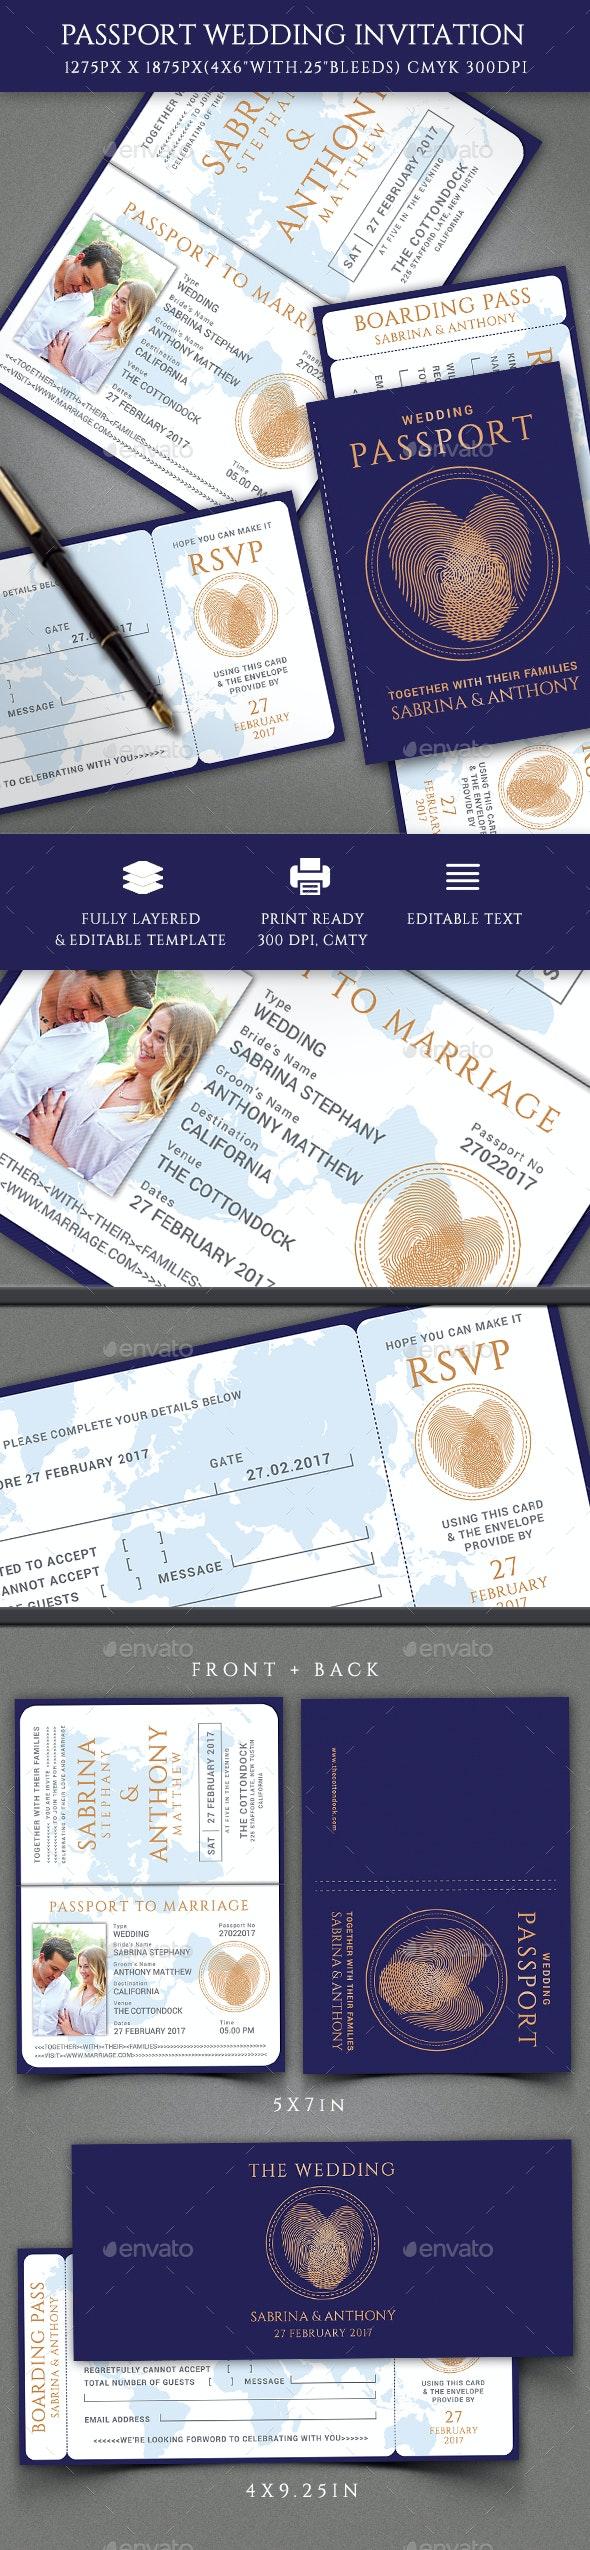 Passport Wedding Invitation - Invitations Cards & Invites